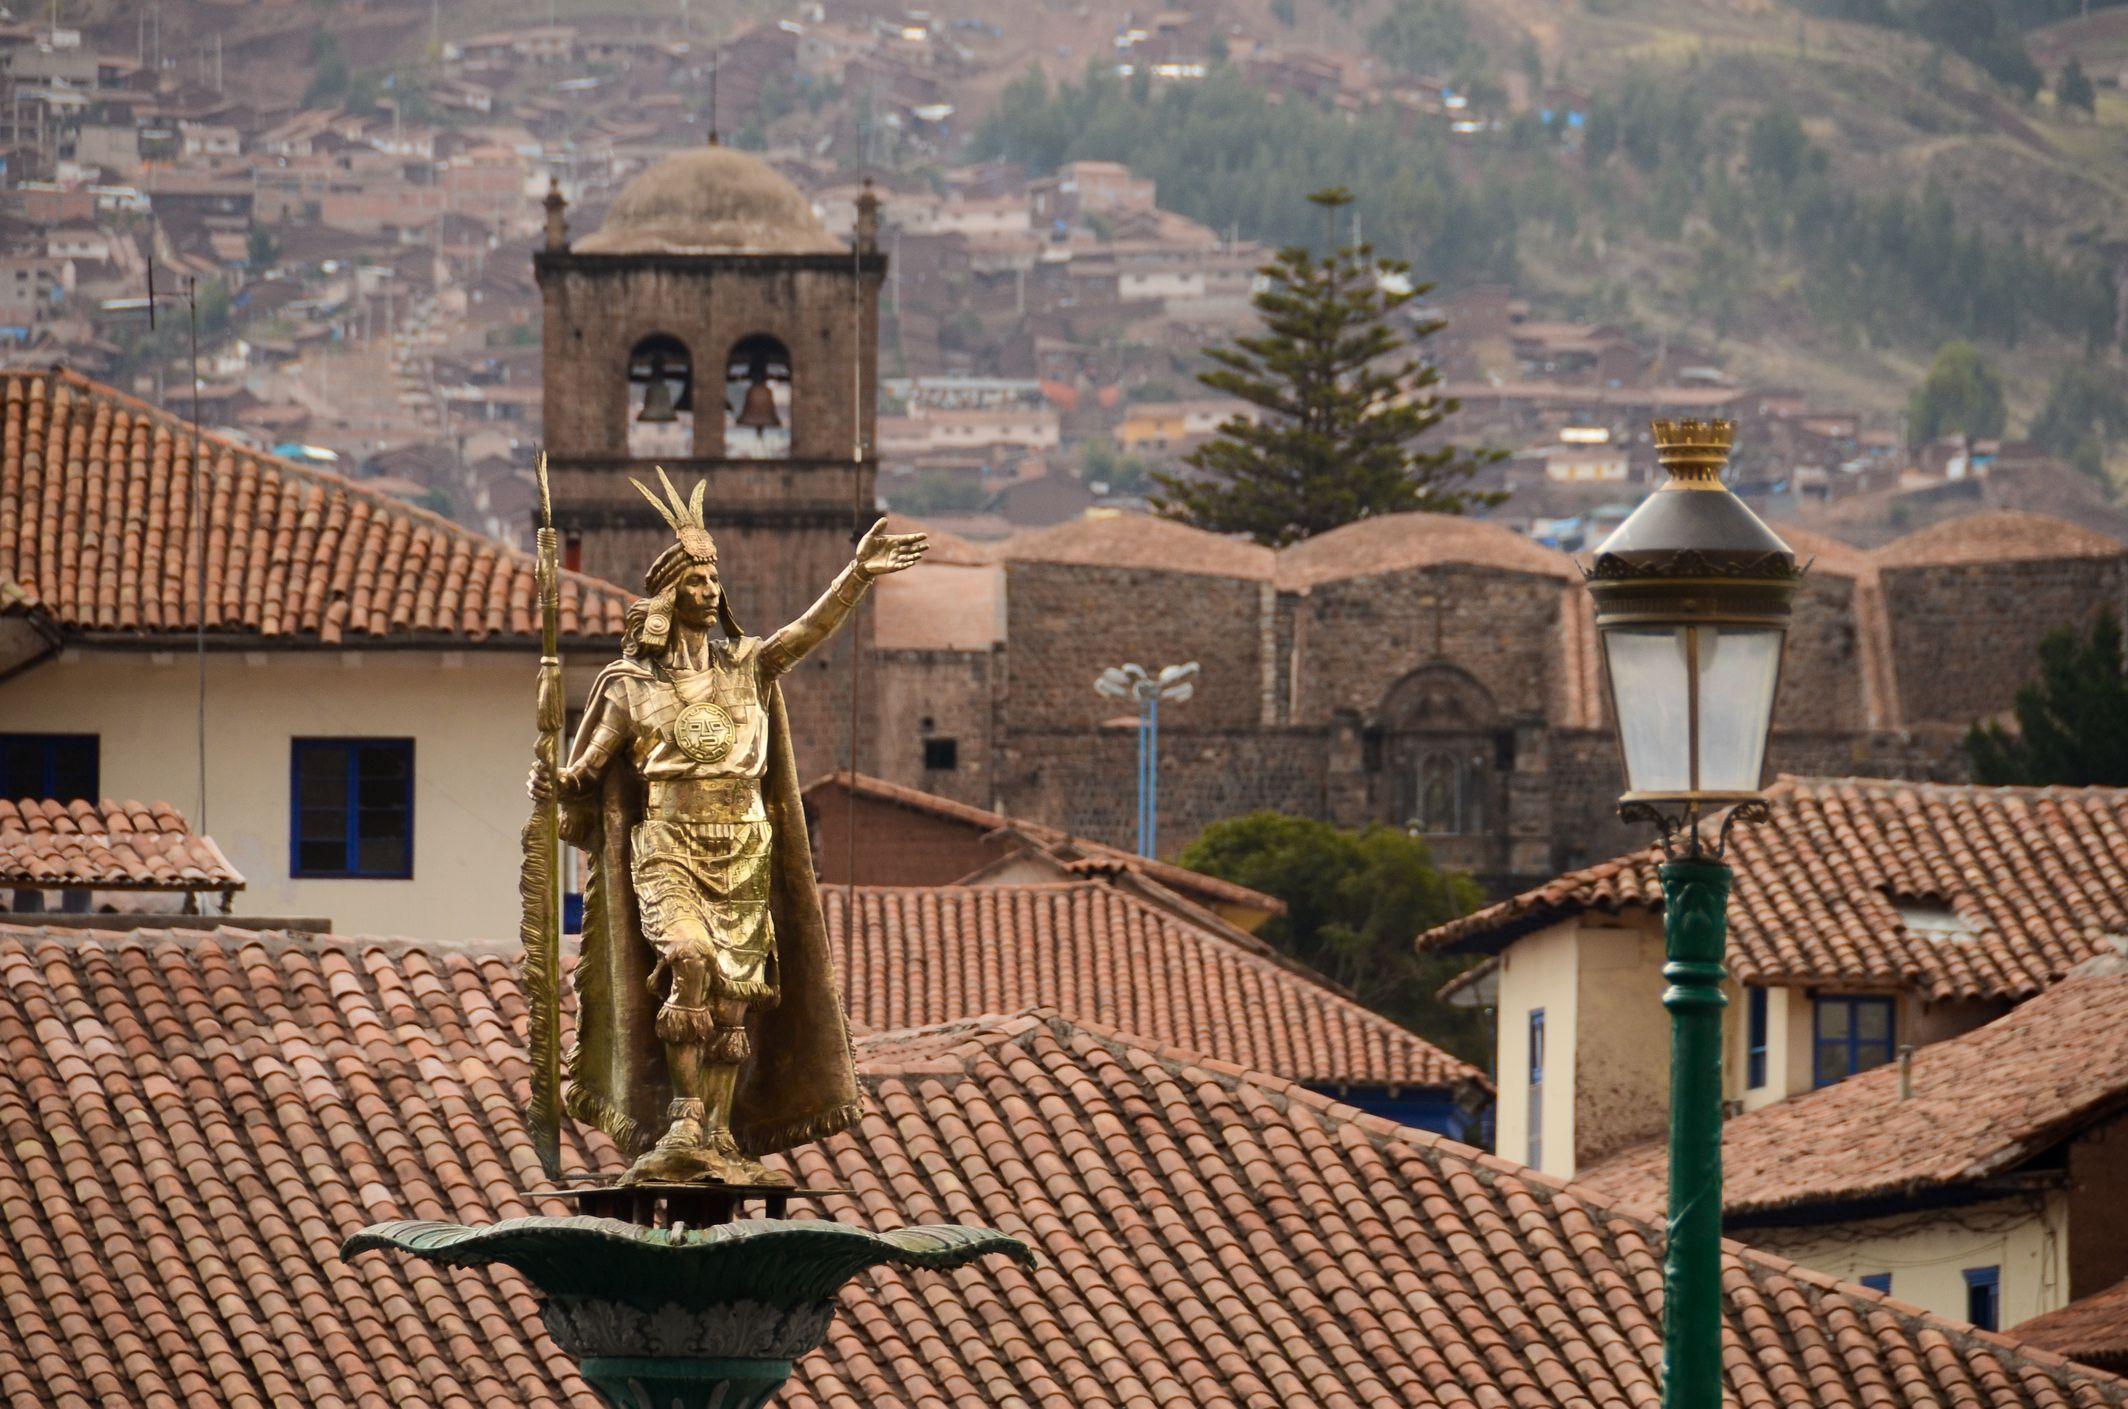 Cuzco, Capital of the Inca Empire